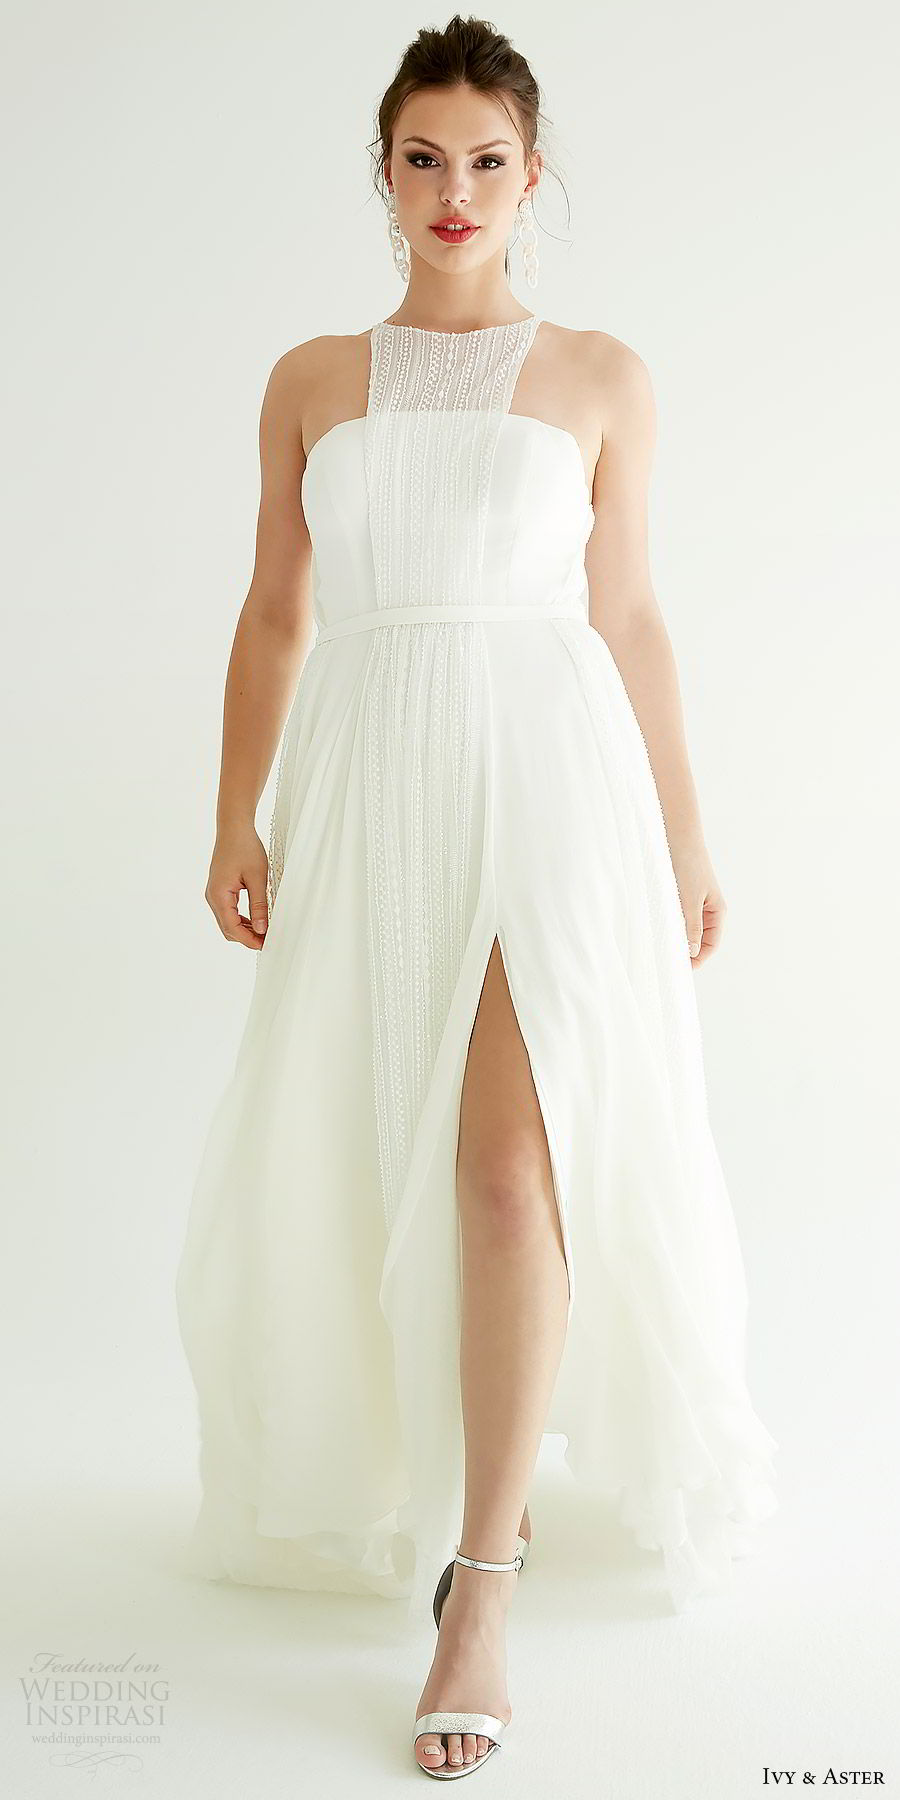 ivy aster bridal 2019 sleeveless jewel neck bib slit skirt minimal a line wedding dress (sophia) mv cutout back modern chic